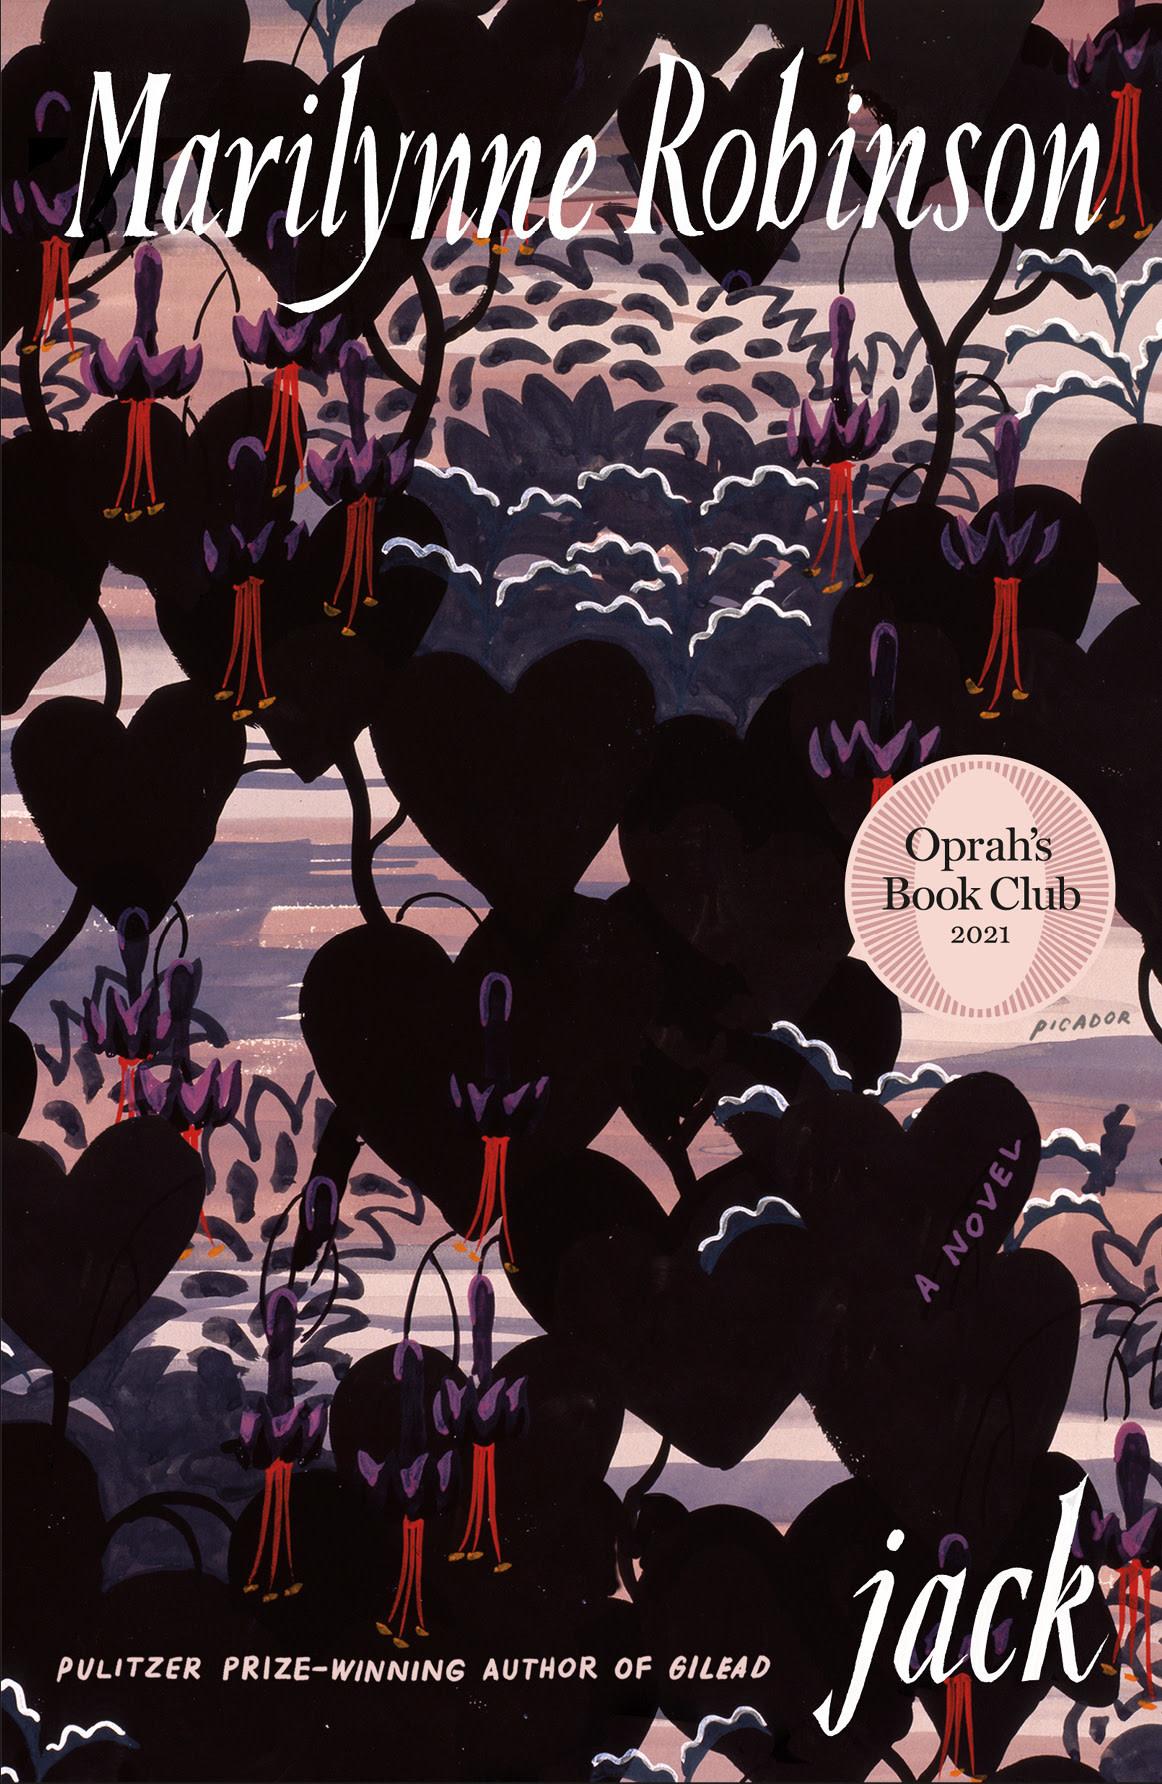 Jack: A novel (Oprah's Book Club 2021)